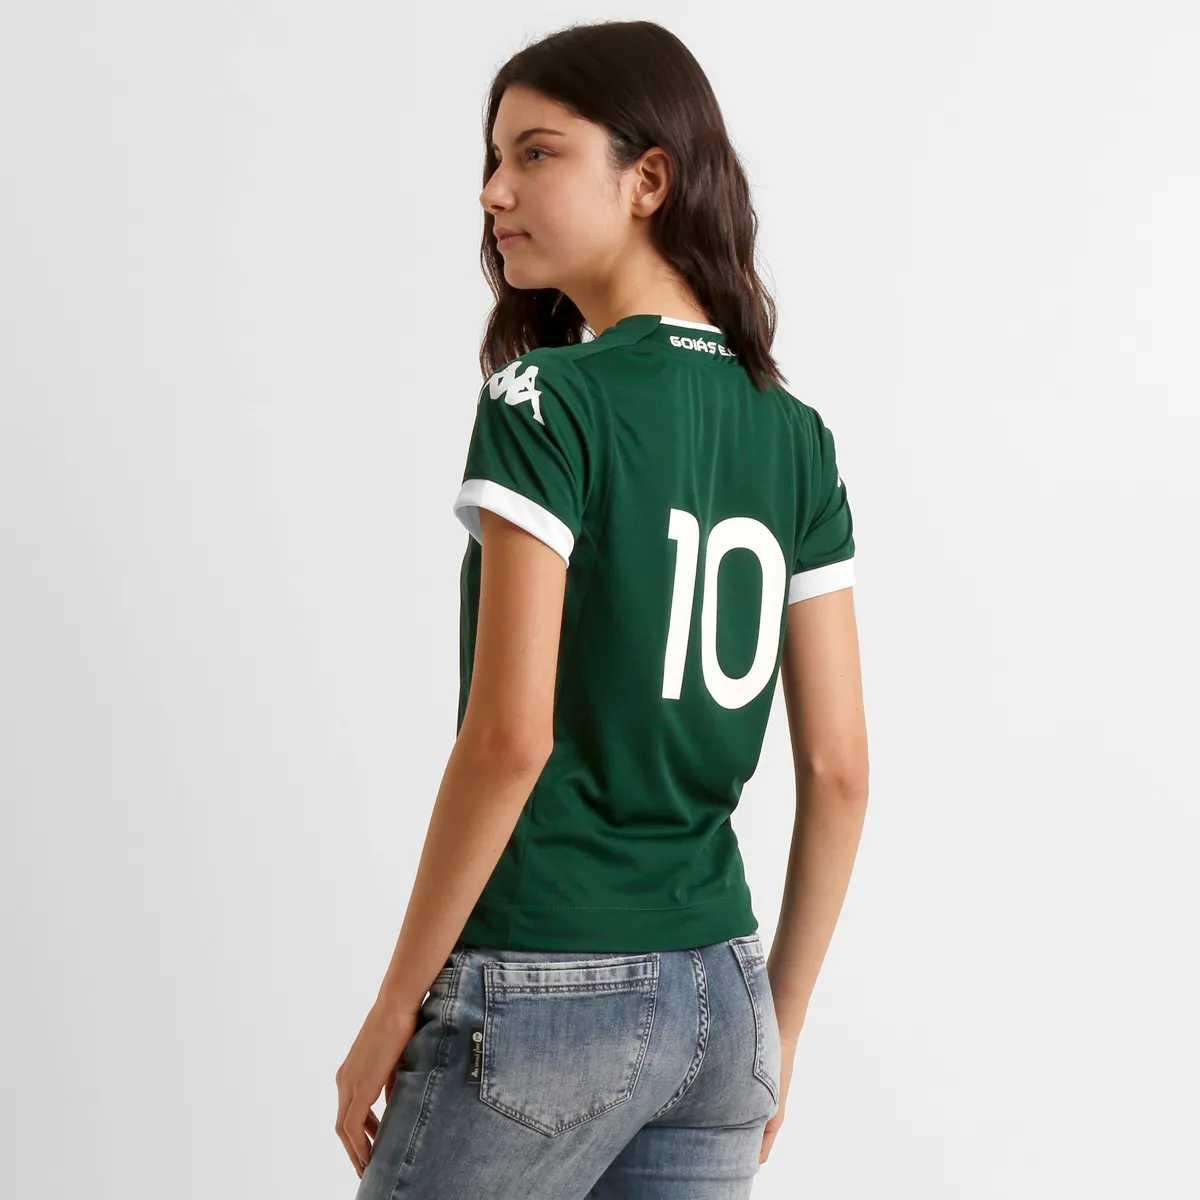 Camisa Goiás I Kappa 2015 S/N